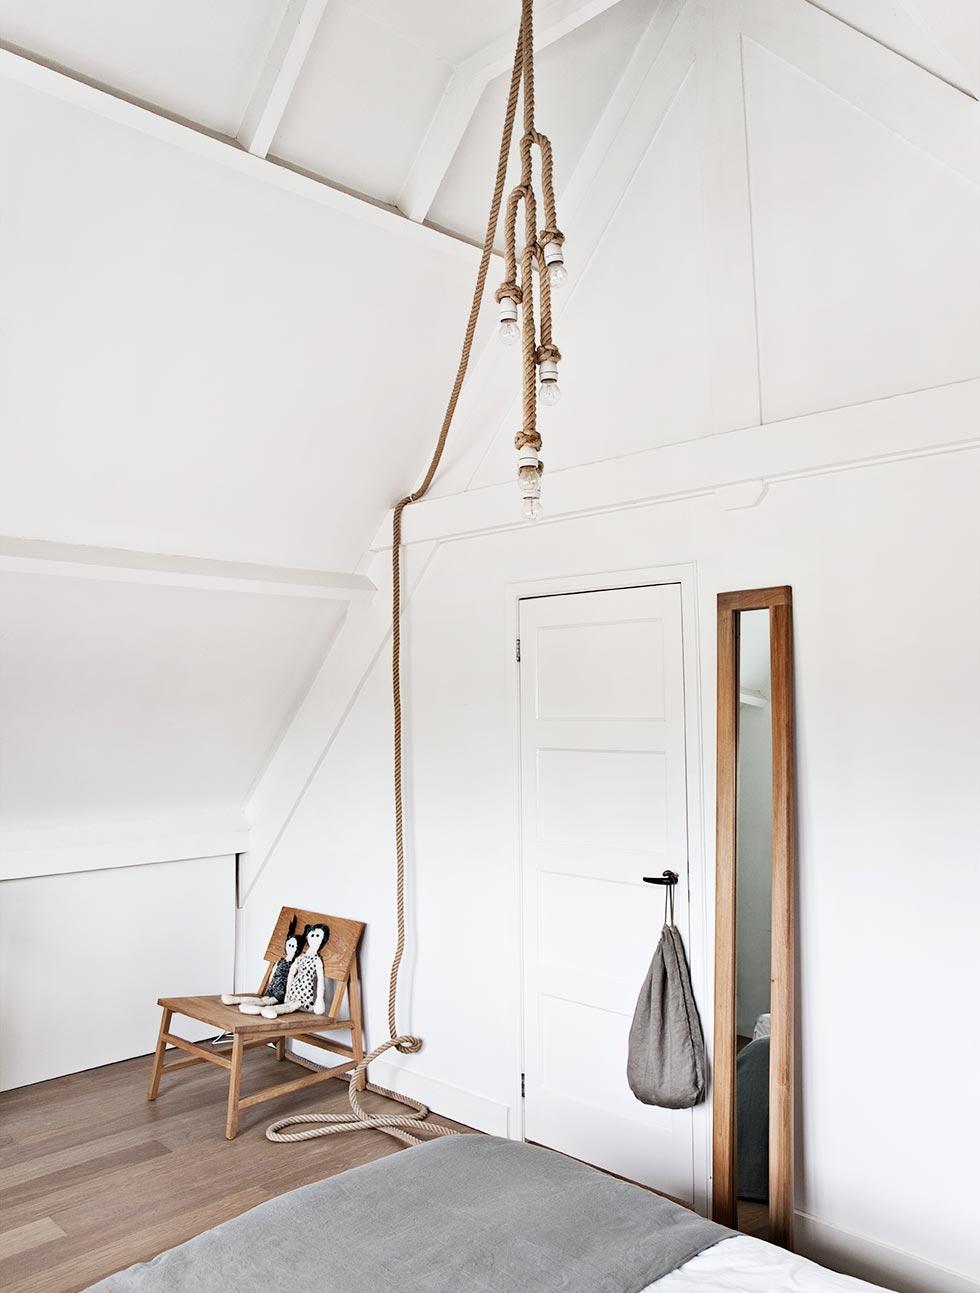 Touw lamp  Interieur inrichting